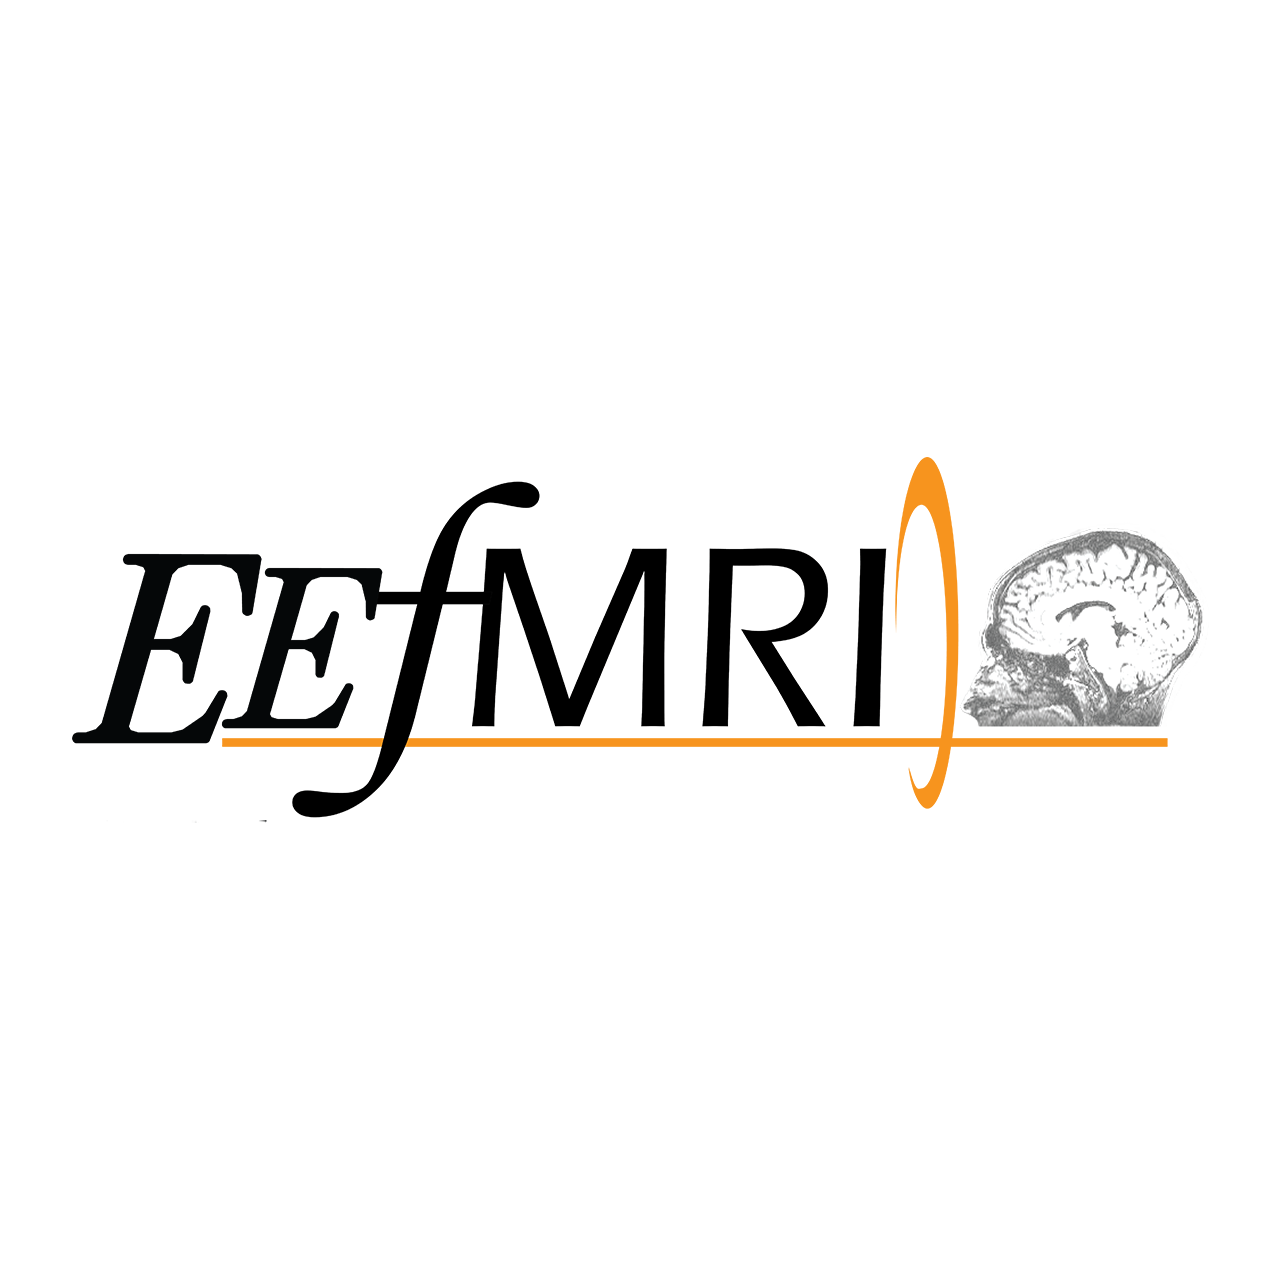 E-Prime Extensions for fMRI 2.0